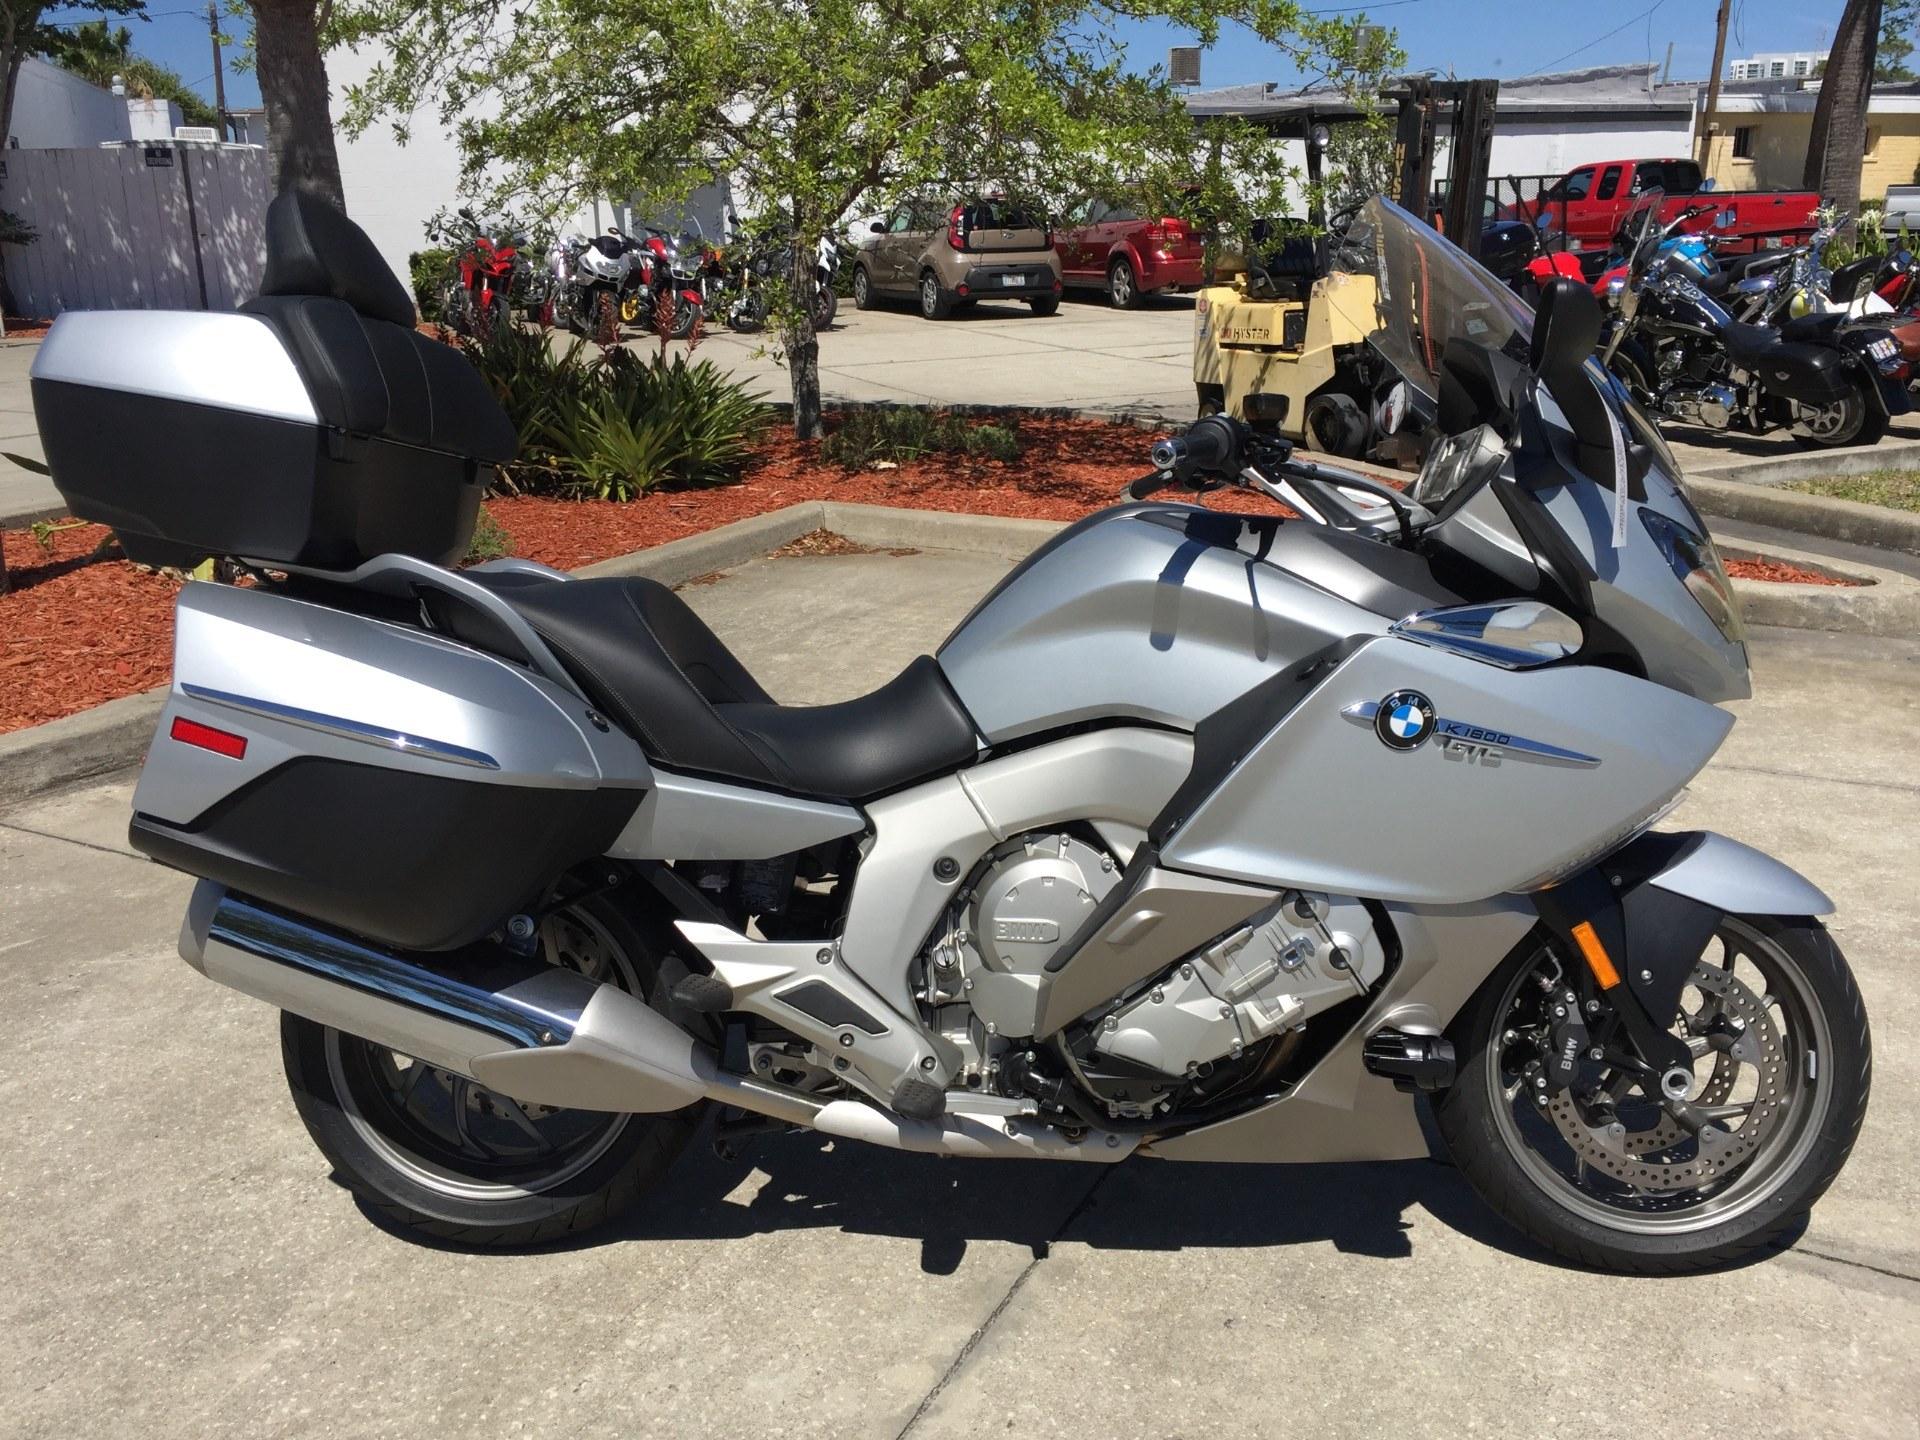 2016 BMW K 1600 GTL in Daytona Beach, Florida